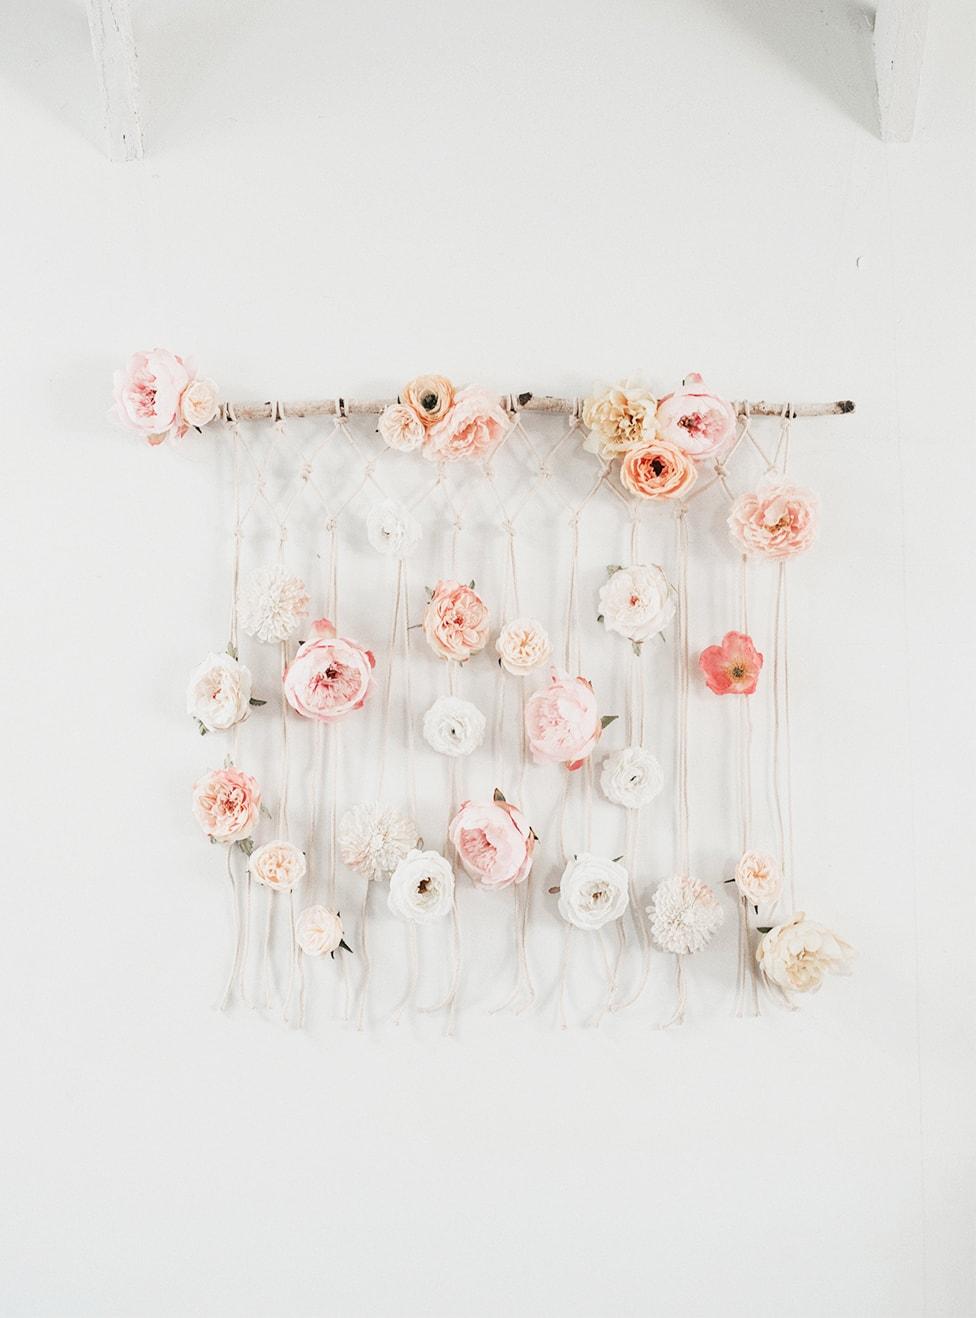 DIY Floral Macrame Wall Hanging